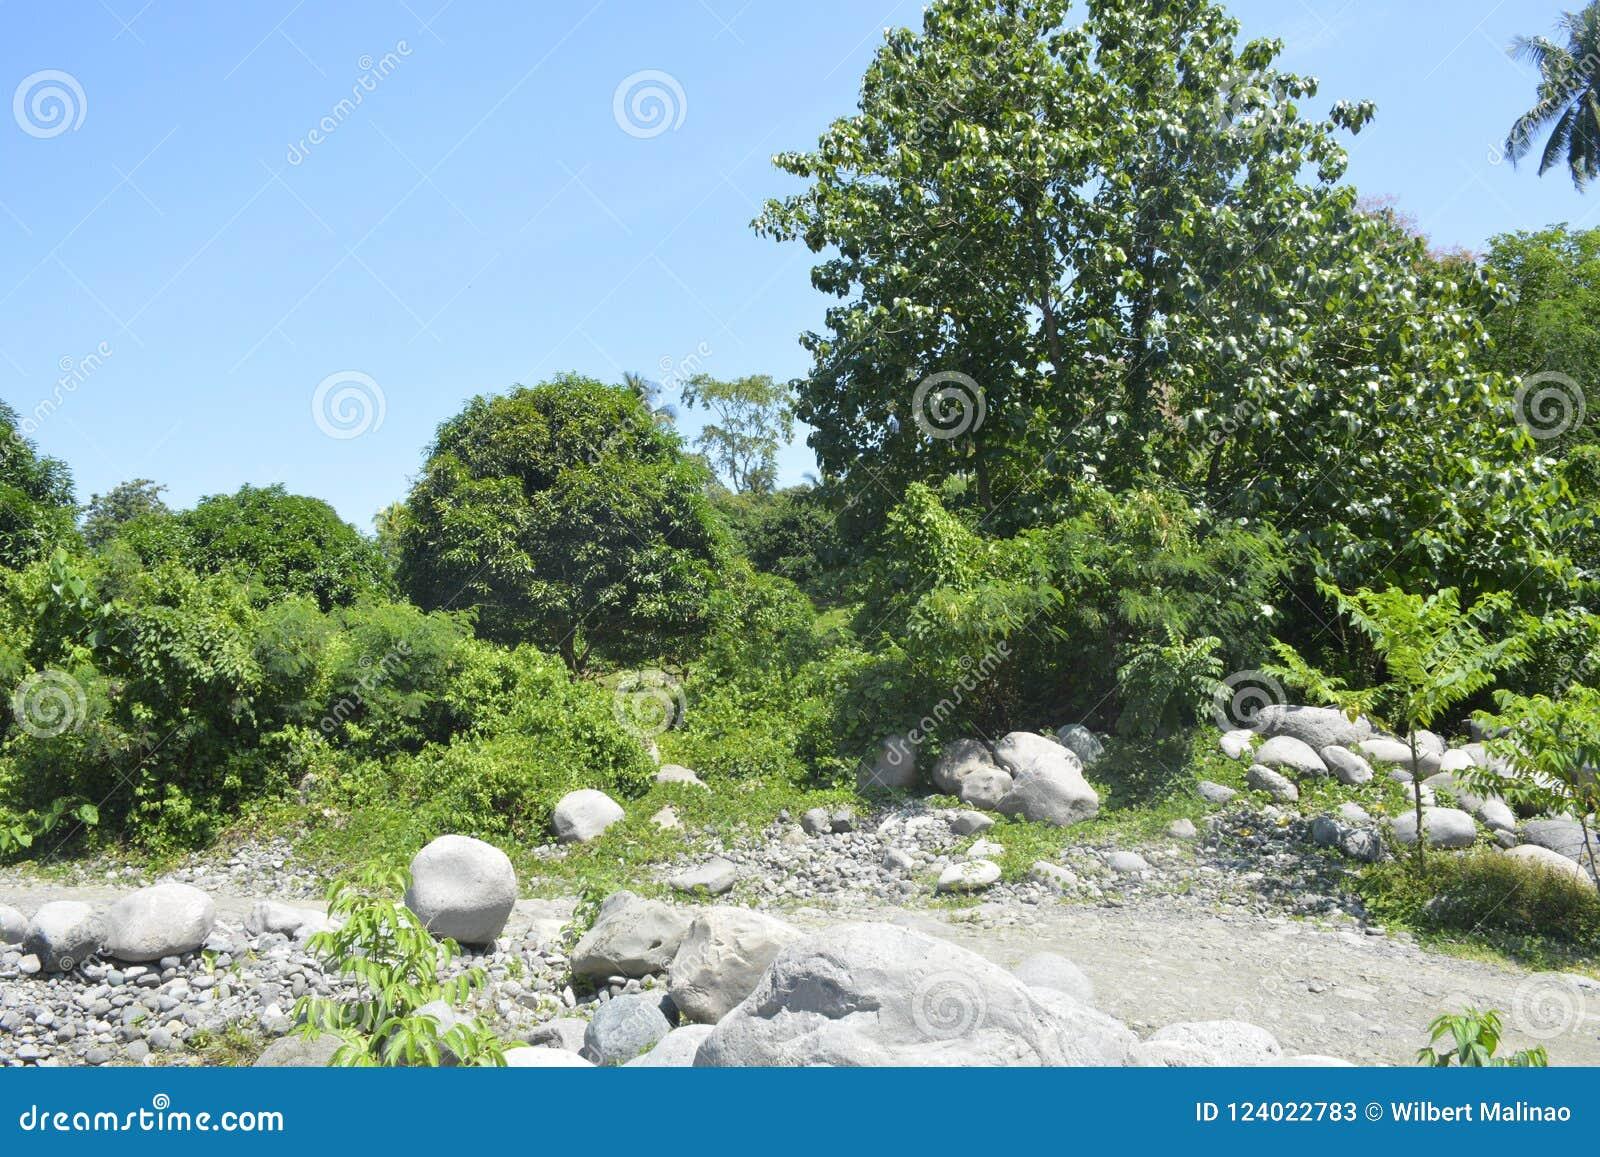 Ruparan河岸位于barangay Ruparan, Digos市,南达沃省,菲律宾